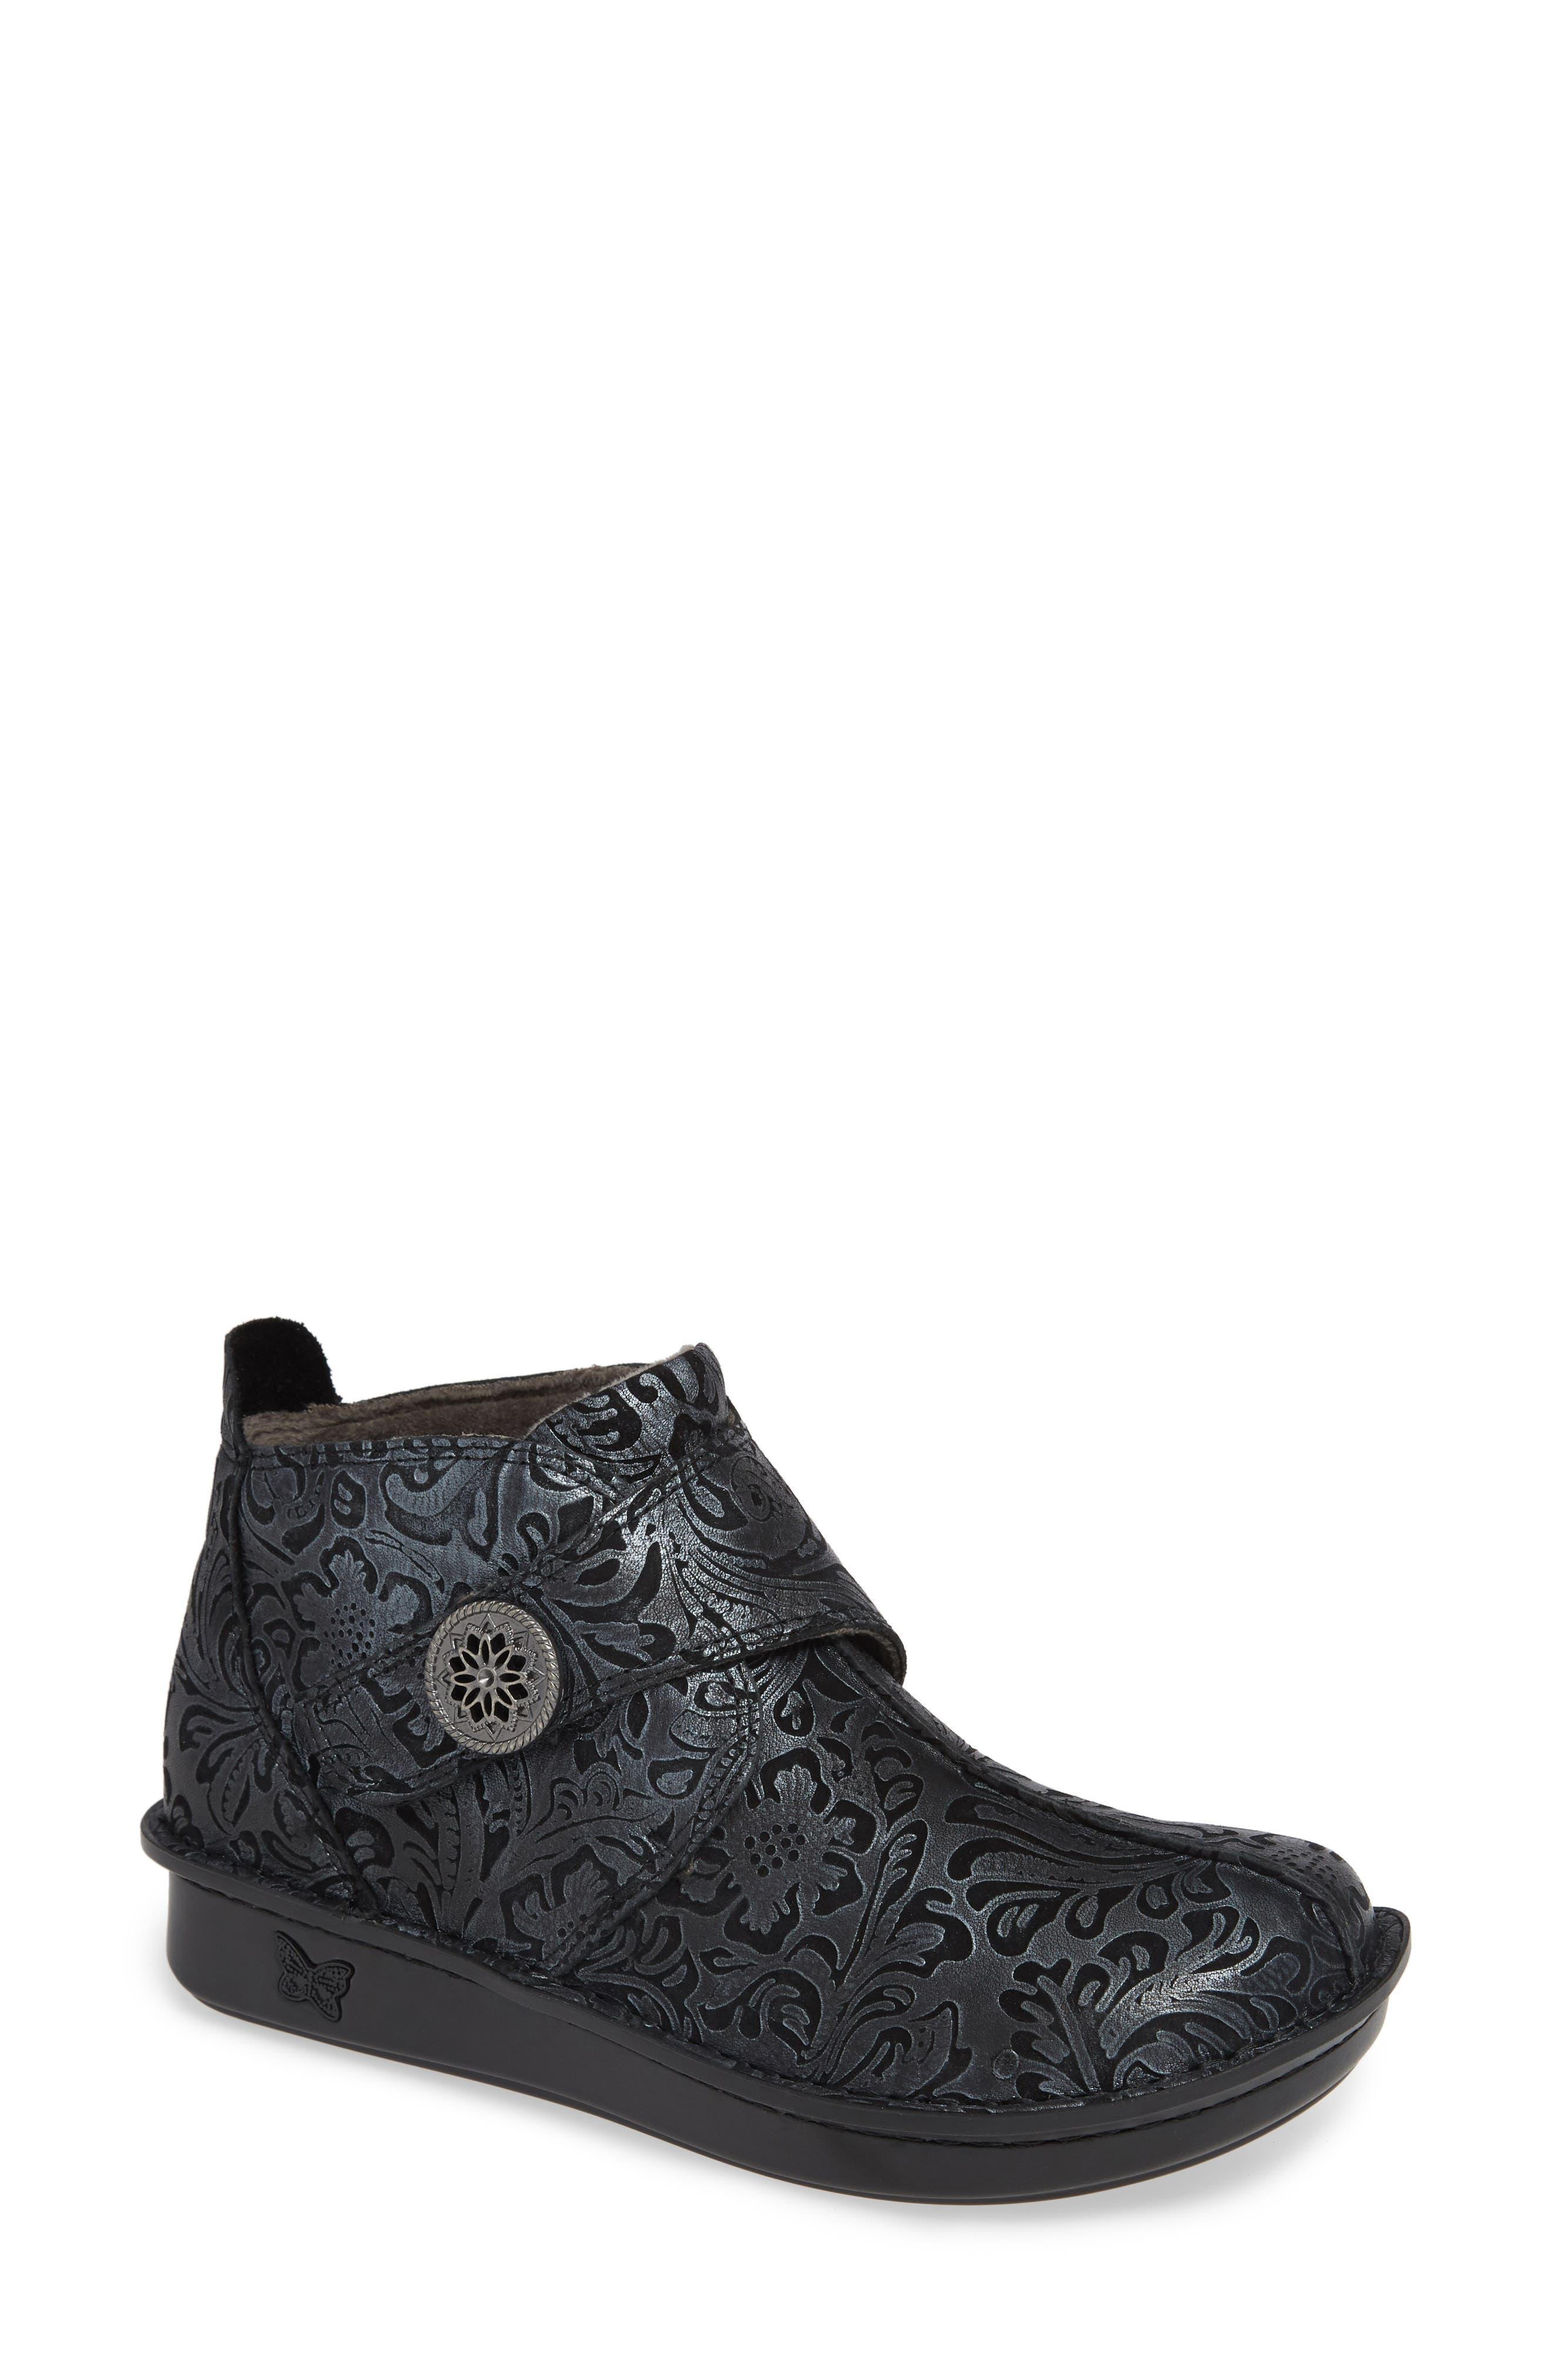 ALEGRIA 'Caiti' Boot, Main, color, STEEL SWISH LEATHER